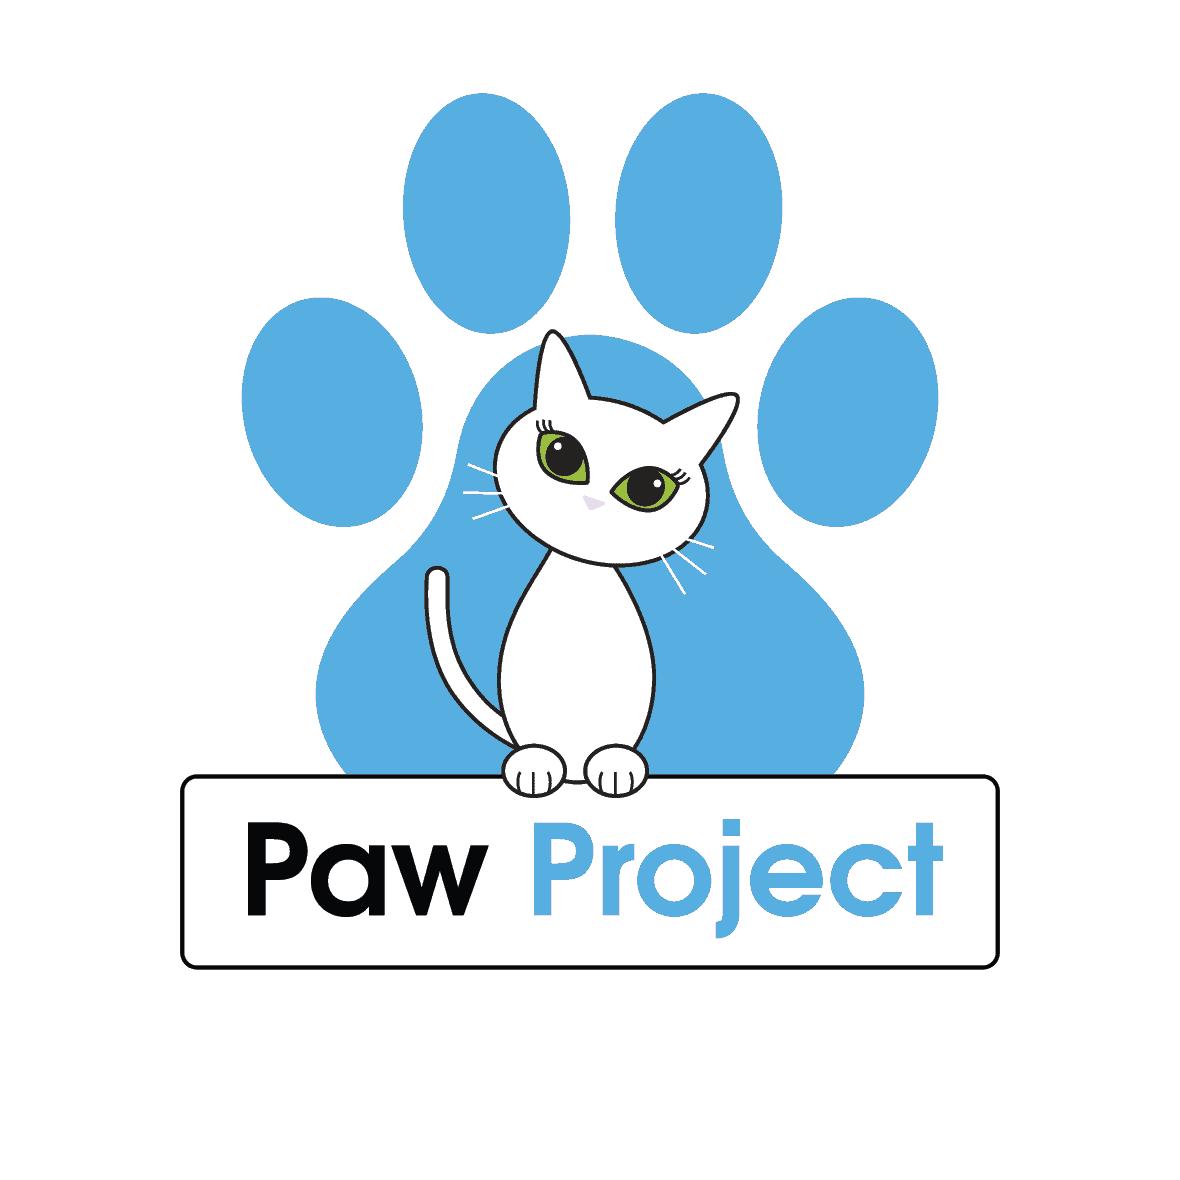 paw project logo